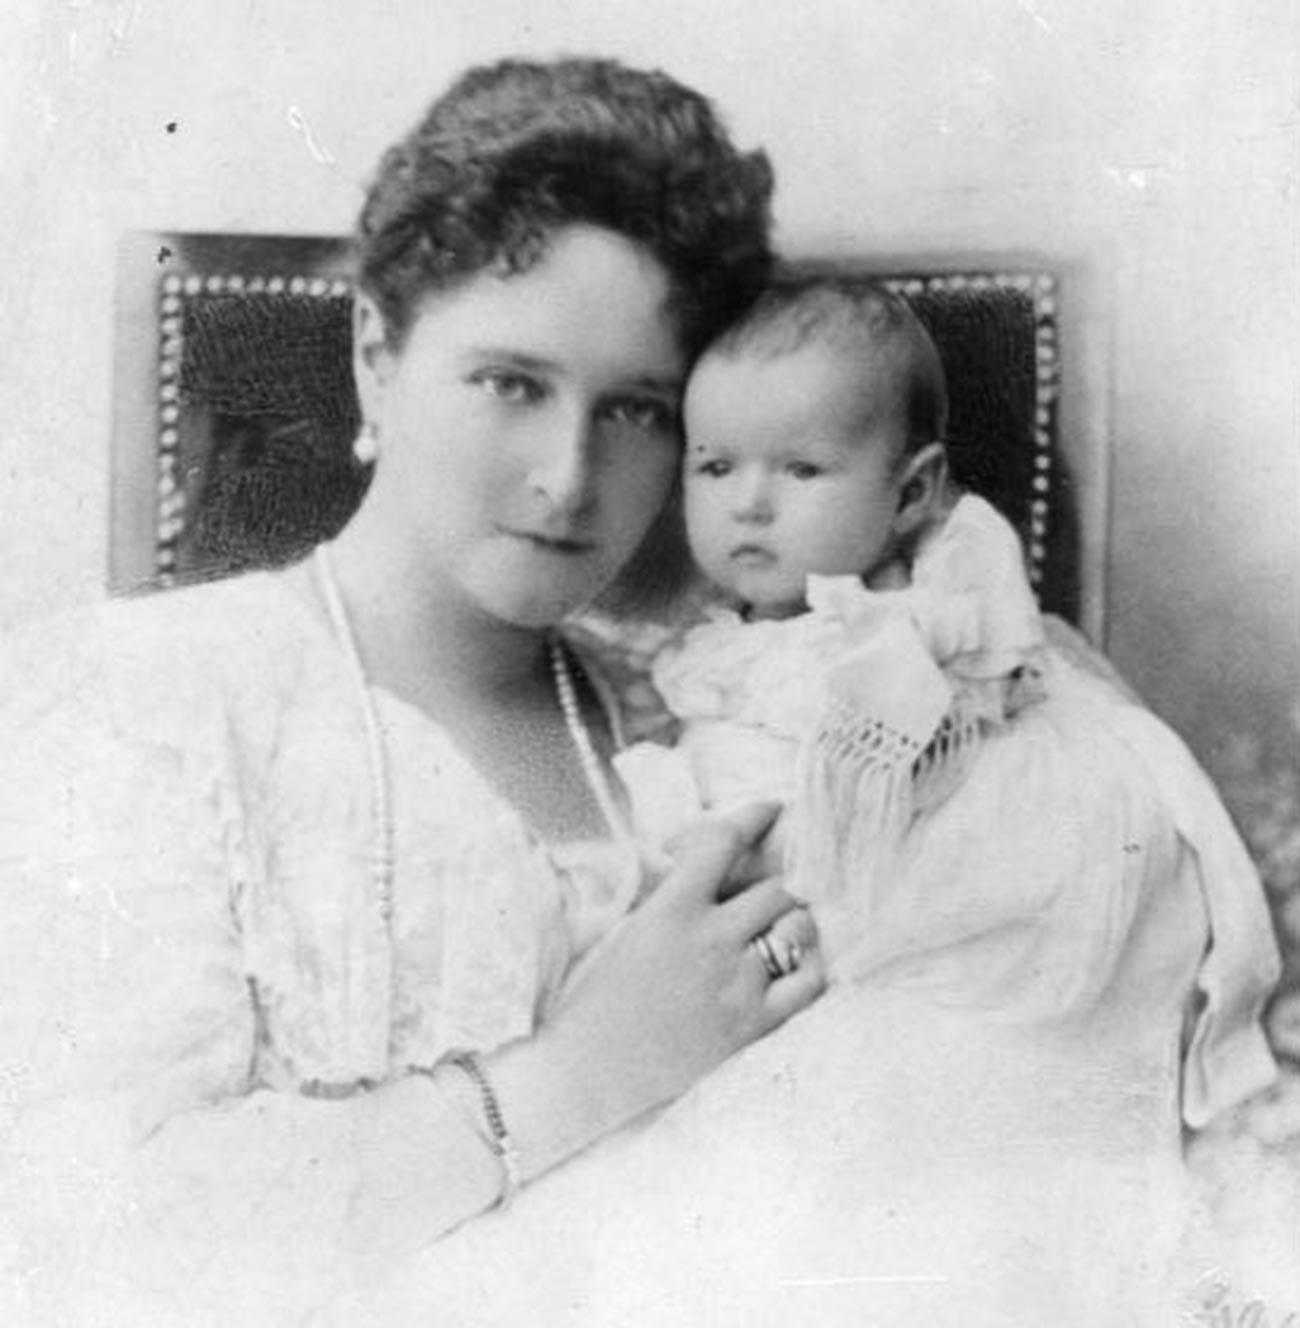 Zarin Alexandra Fjodorowna mit Tochter Anastasia Nikolajewna Romanowa